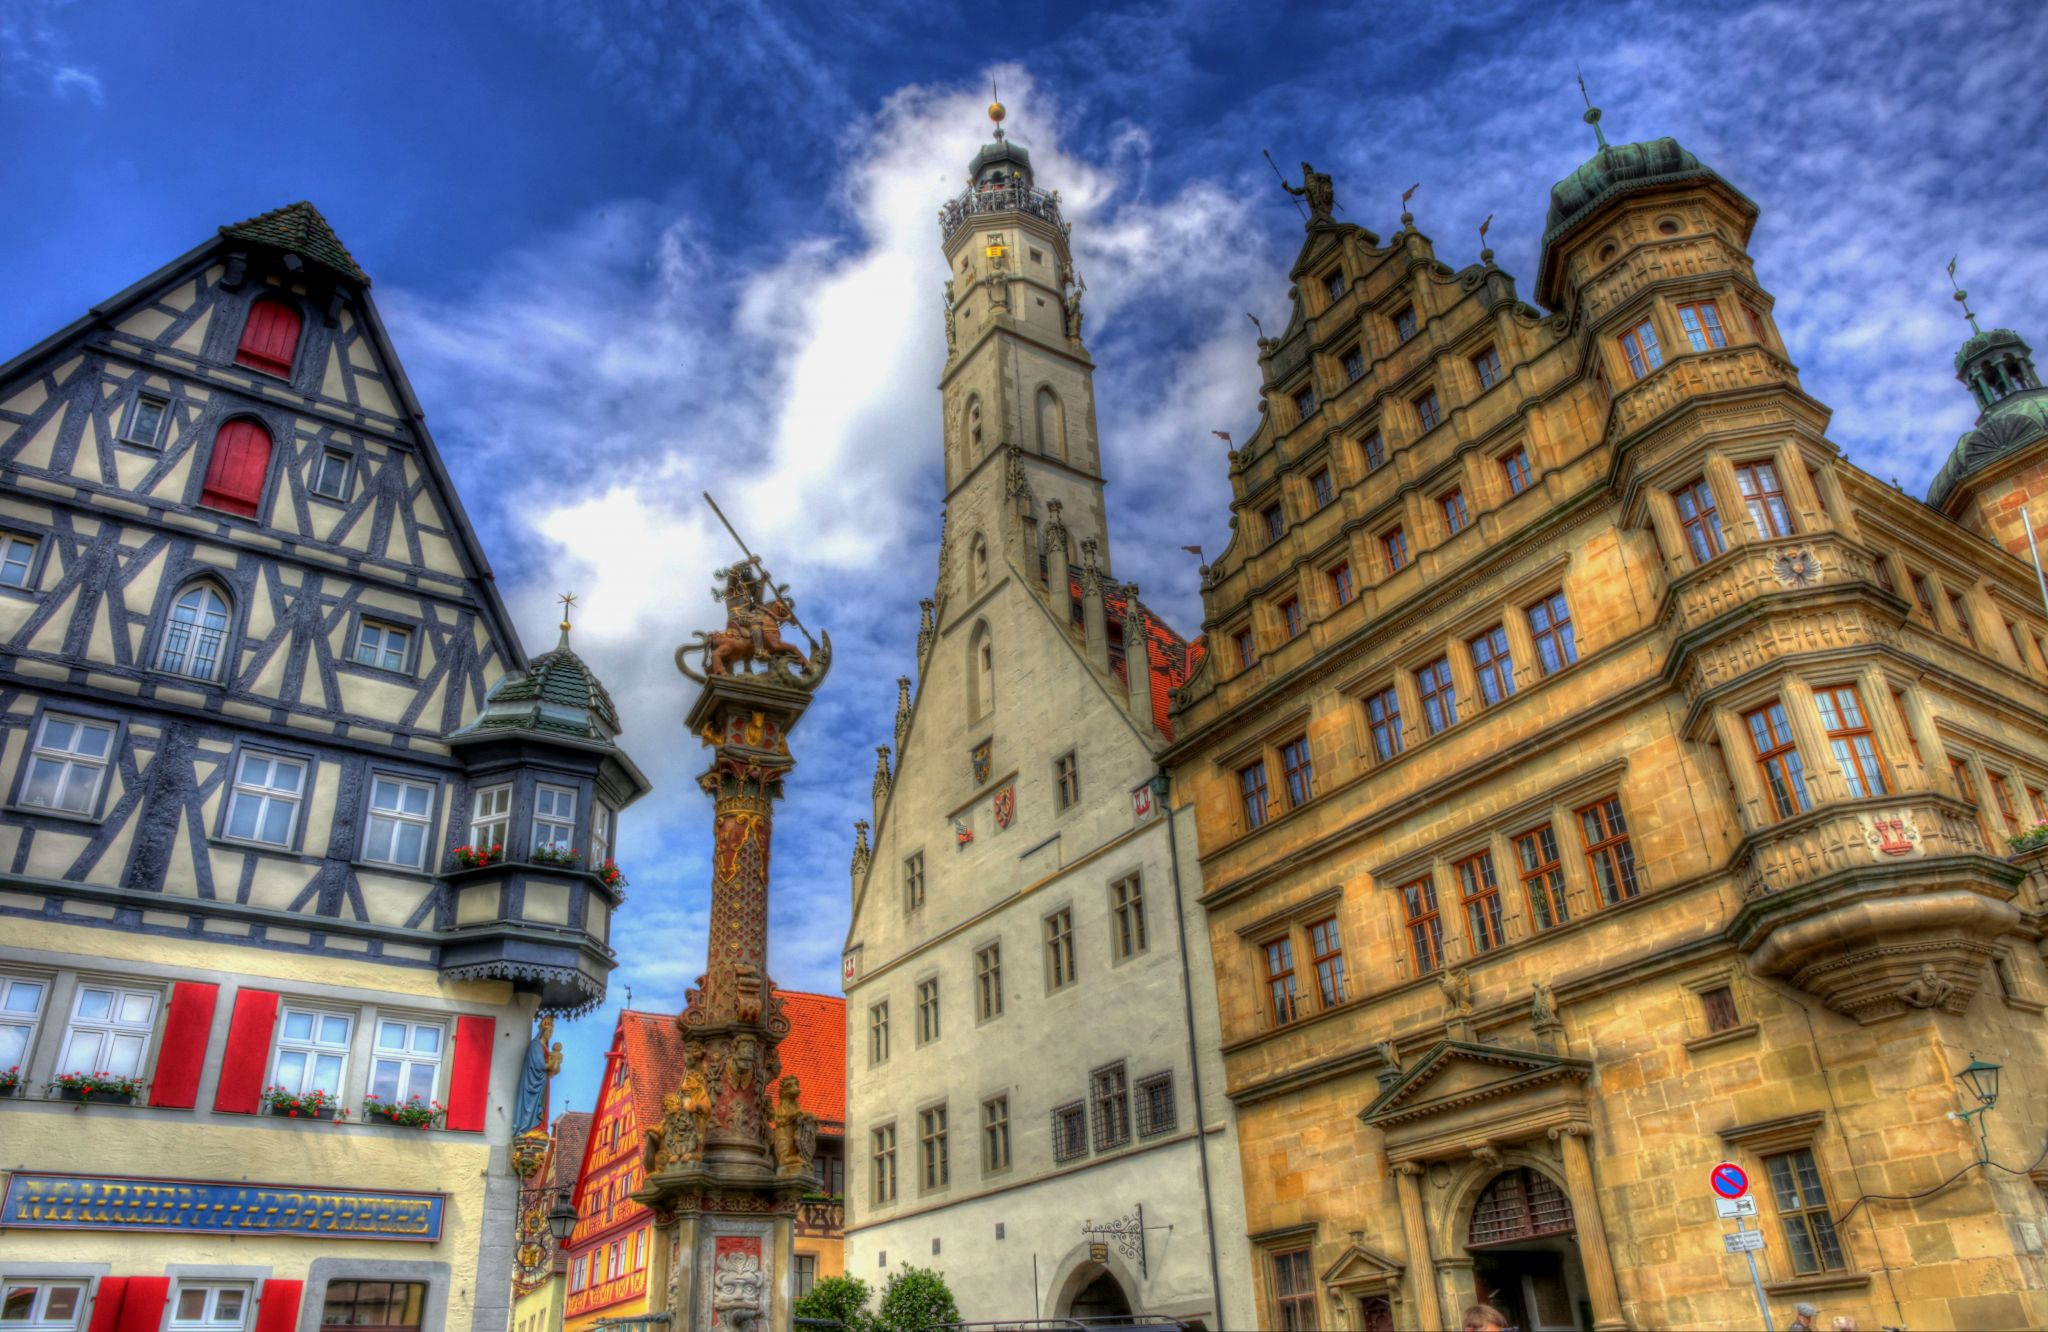 Rothenburg ob der Tauber, Germany, Germany